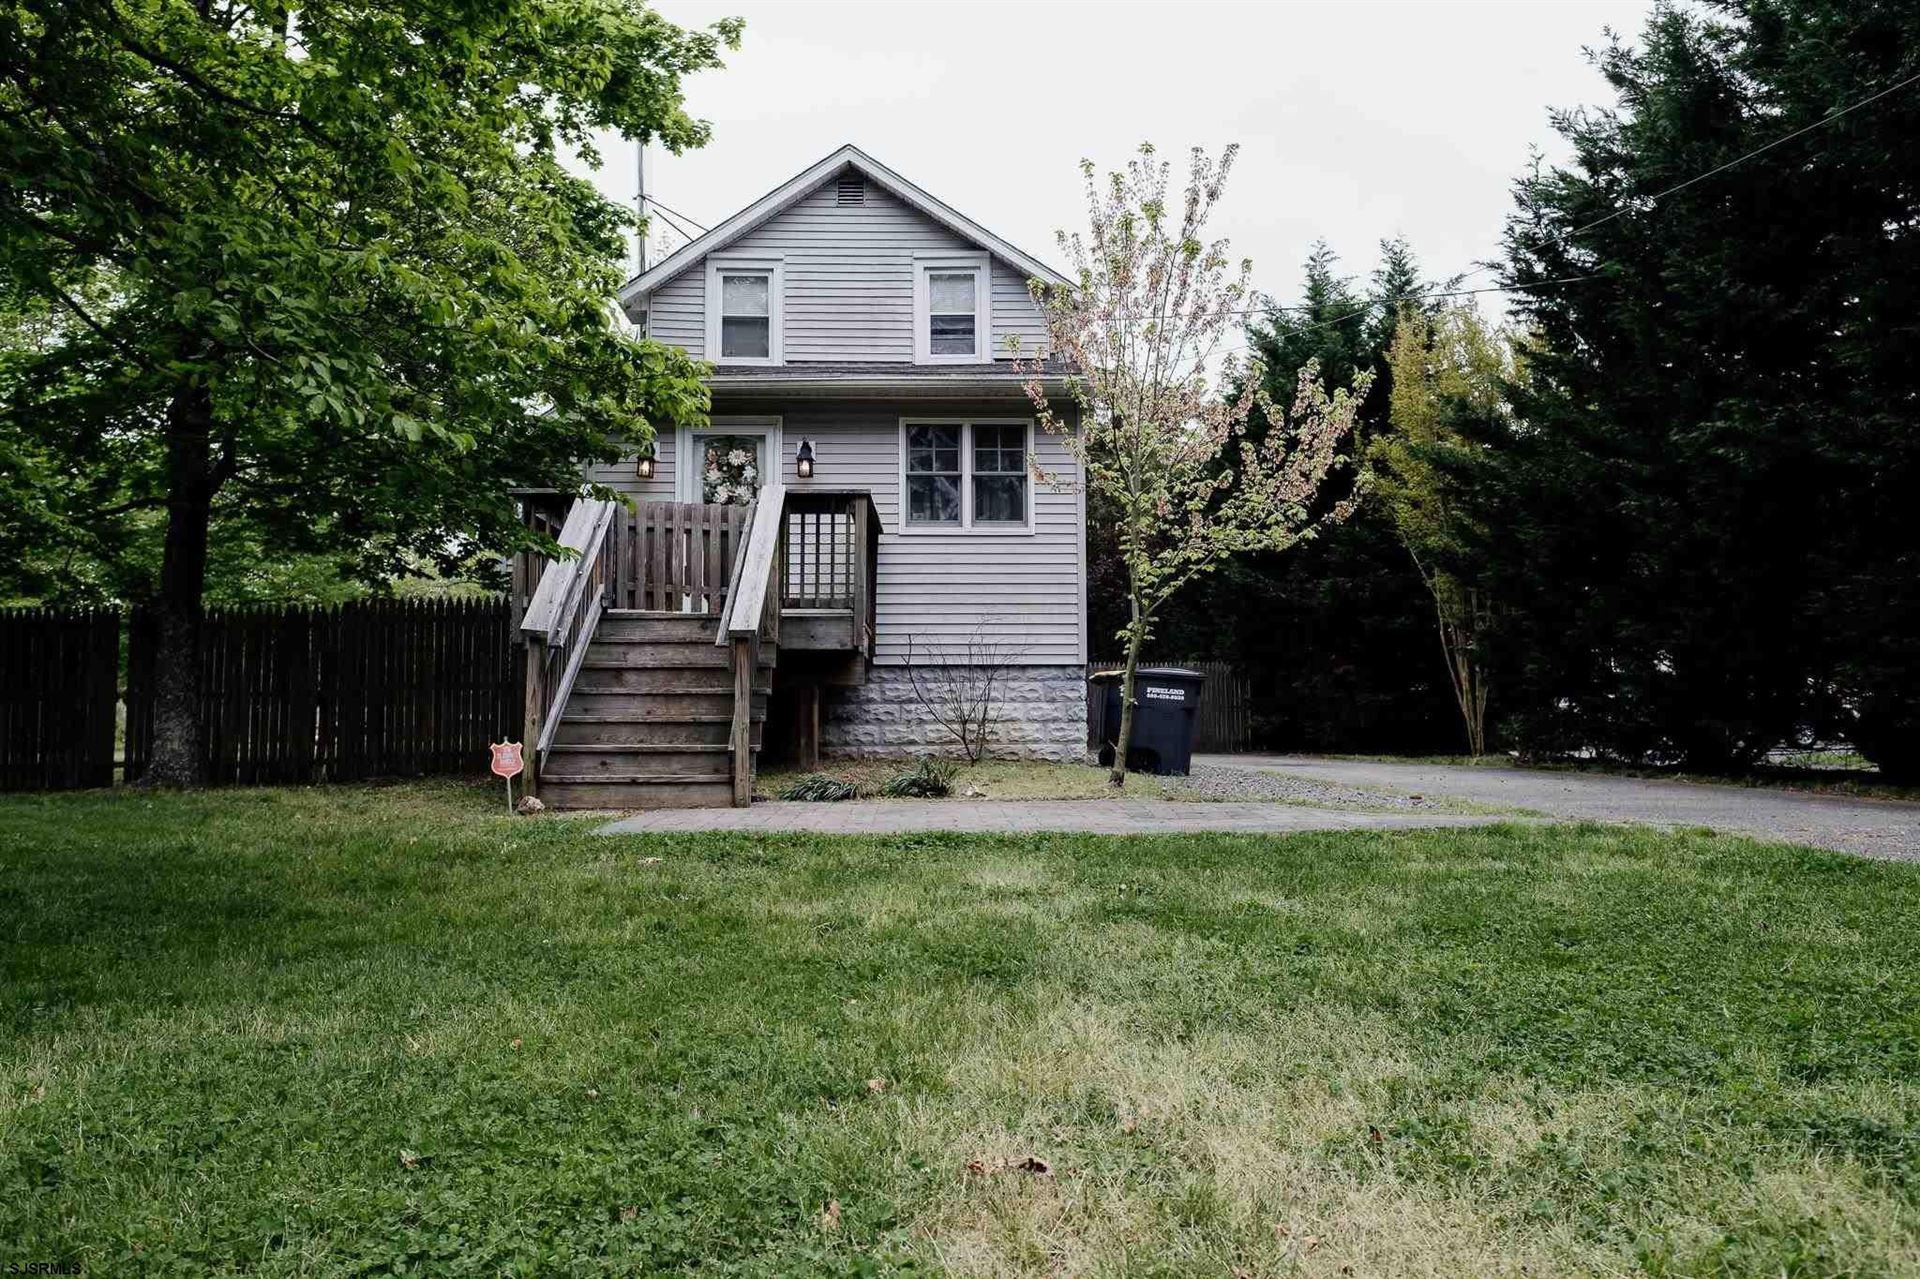 414 S 2nd, Galloway, NJ 08205 - #: 550408